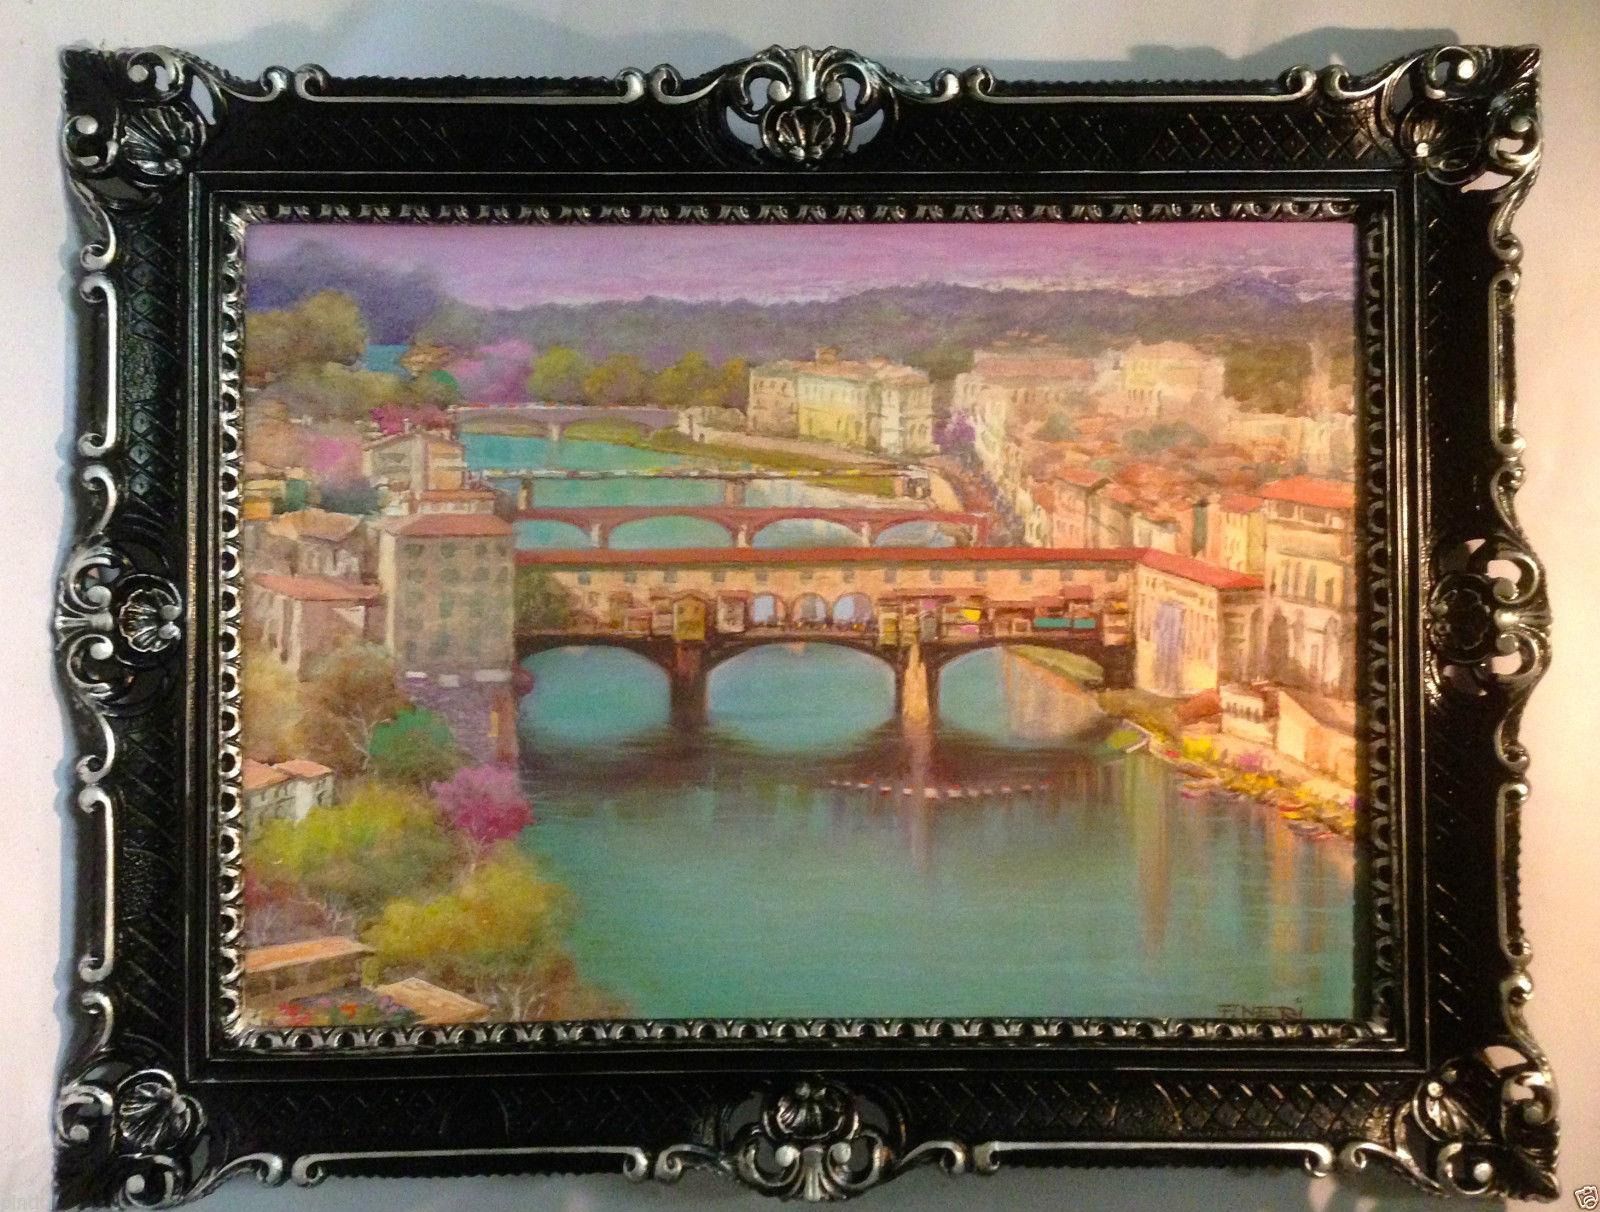 Gemälde Ponte Vecchio Brücke Florenz Aquarell 90x70 Bild mit Rahmen ...